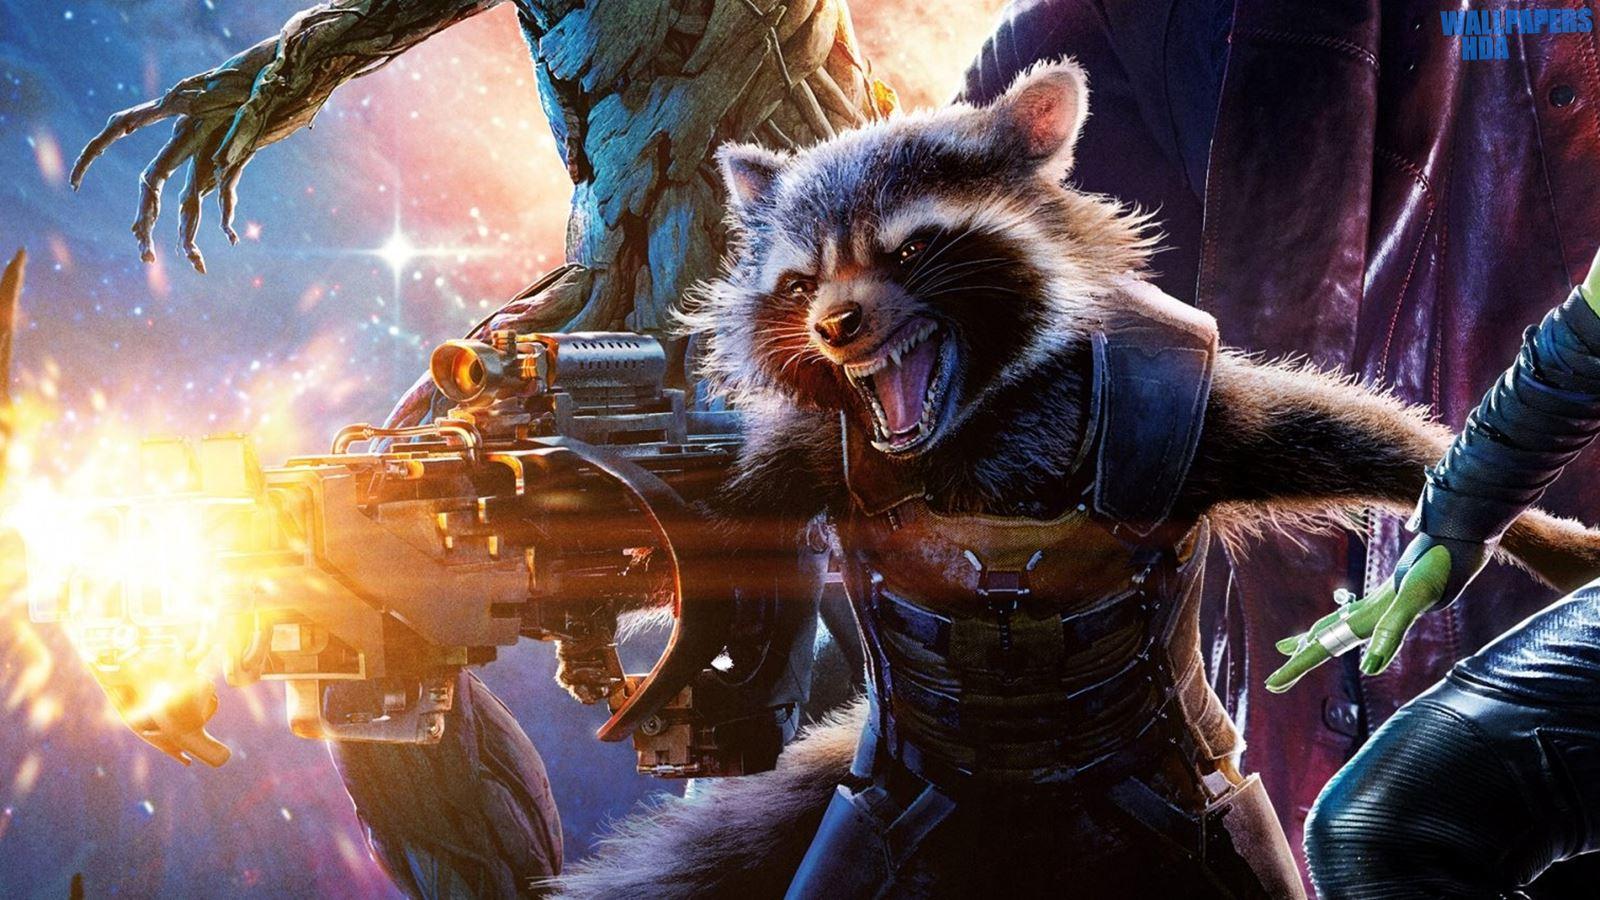 Guardians of the galaxy rocket raccoon wallpaper 1600900 1600x900